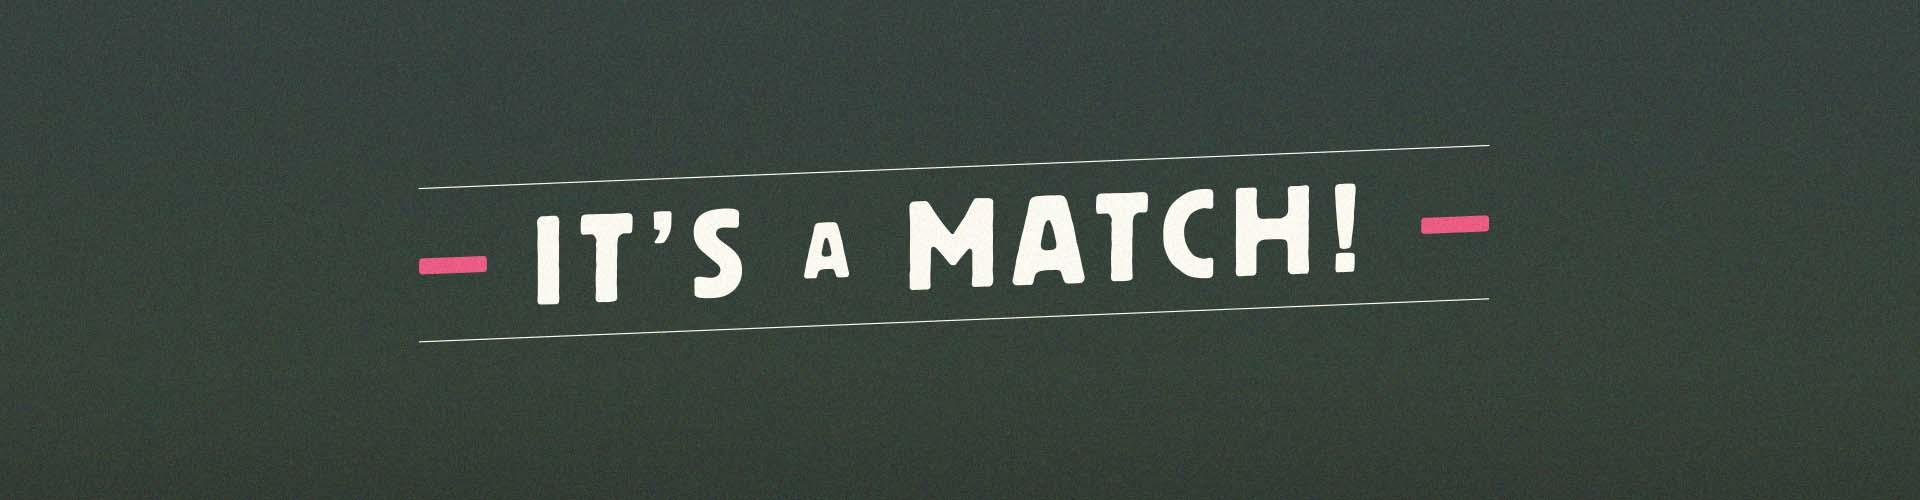 homepage_match_presentation.jpg